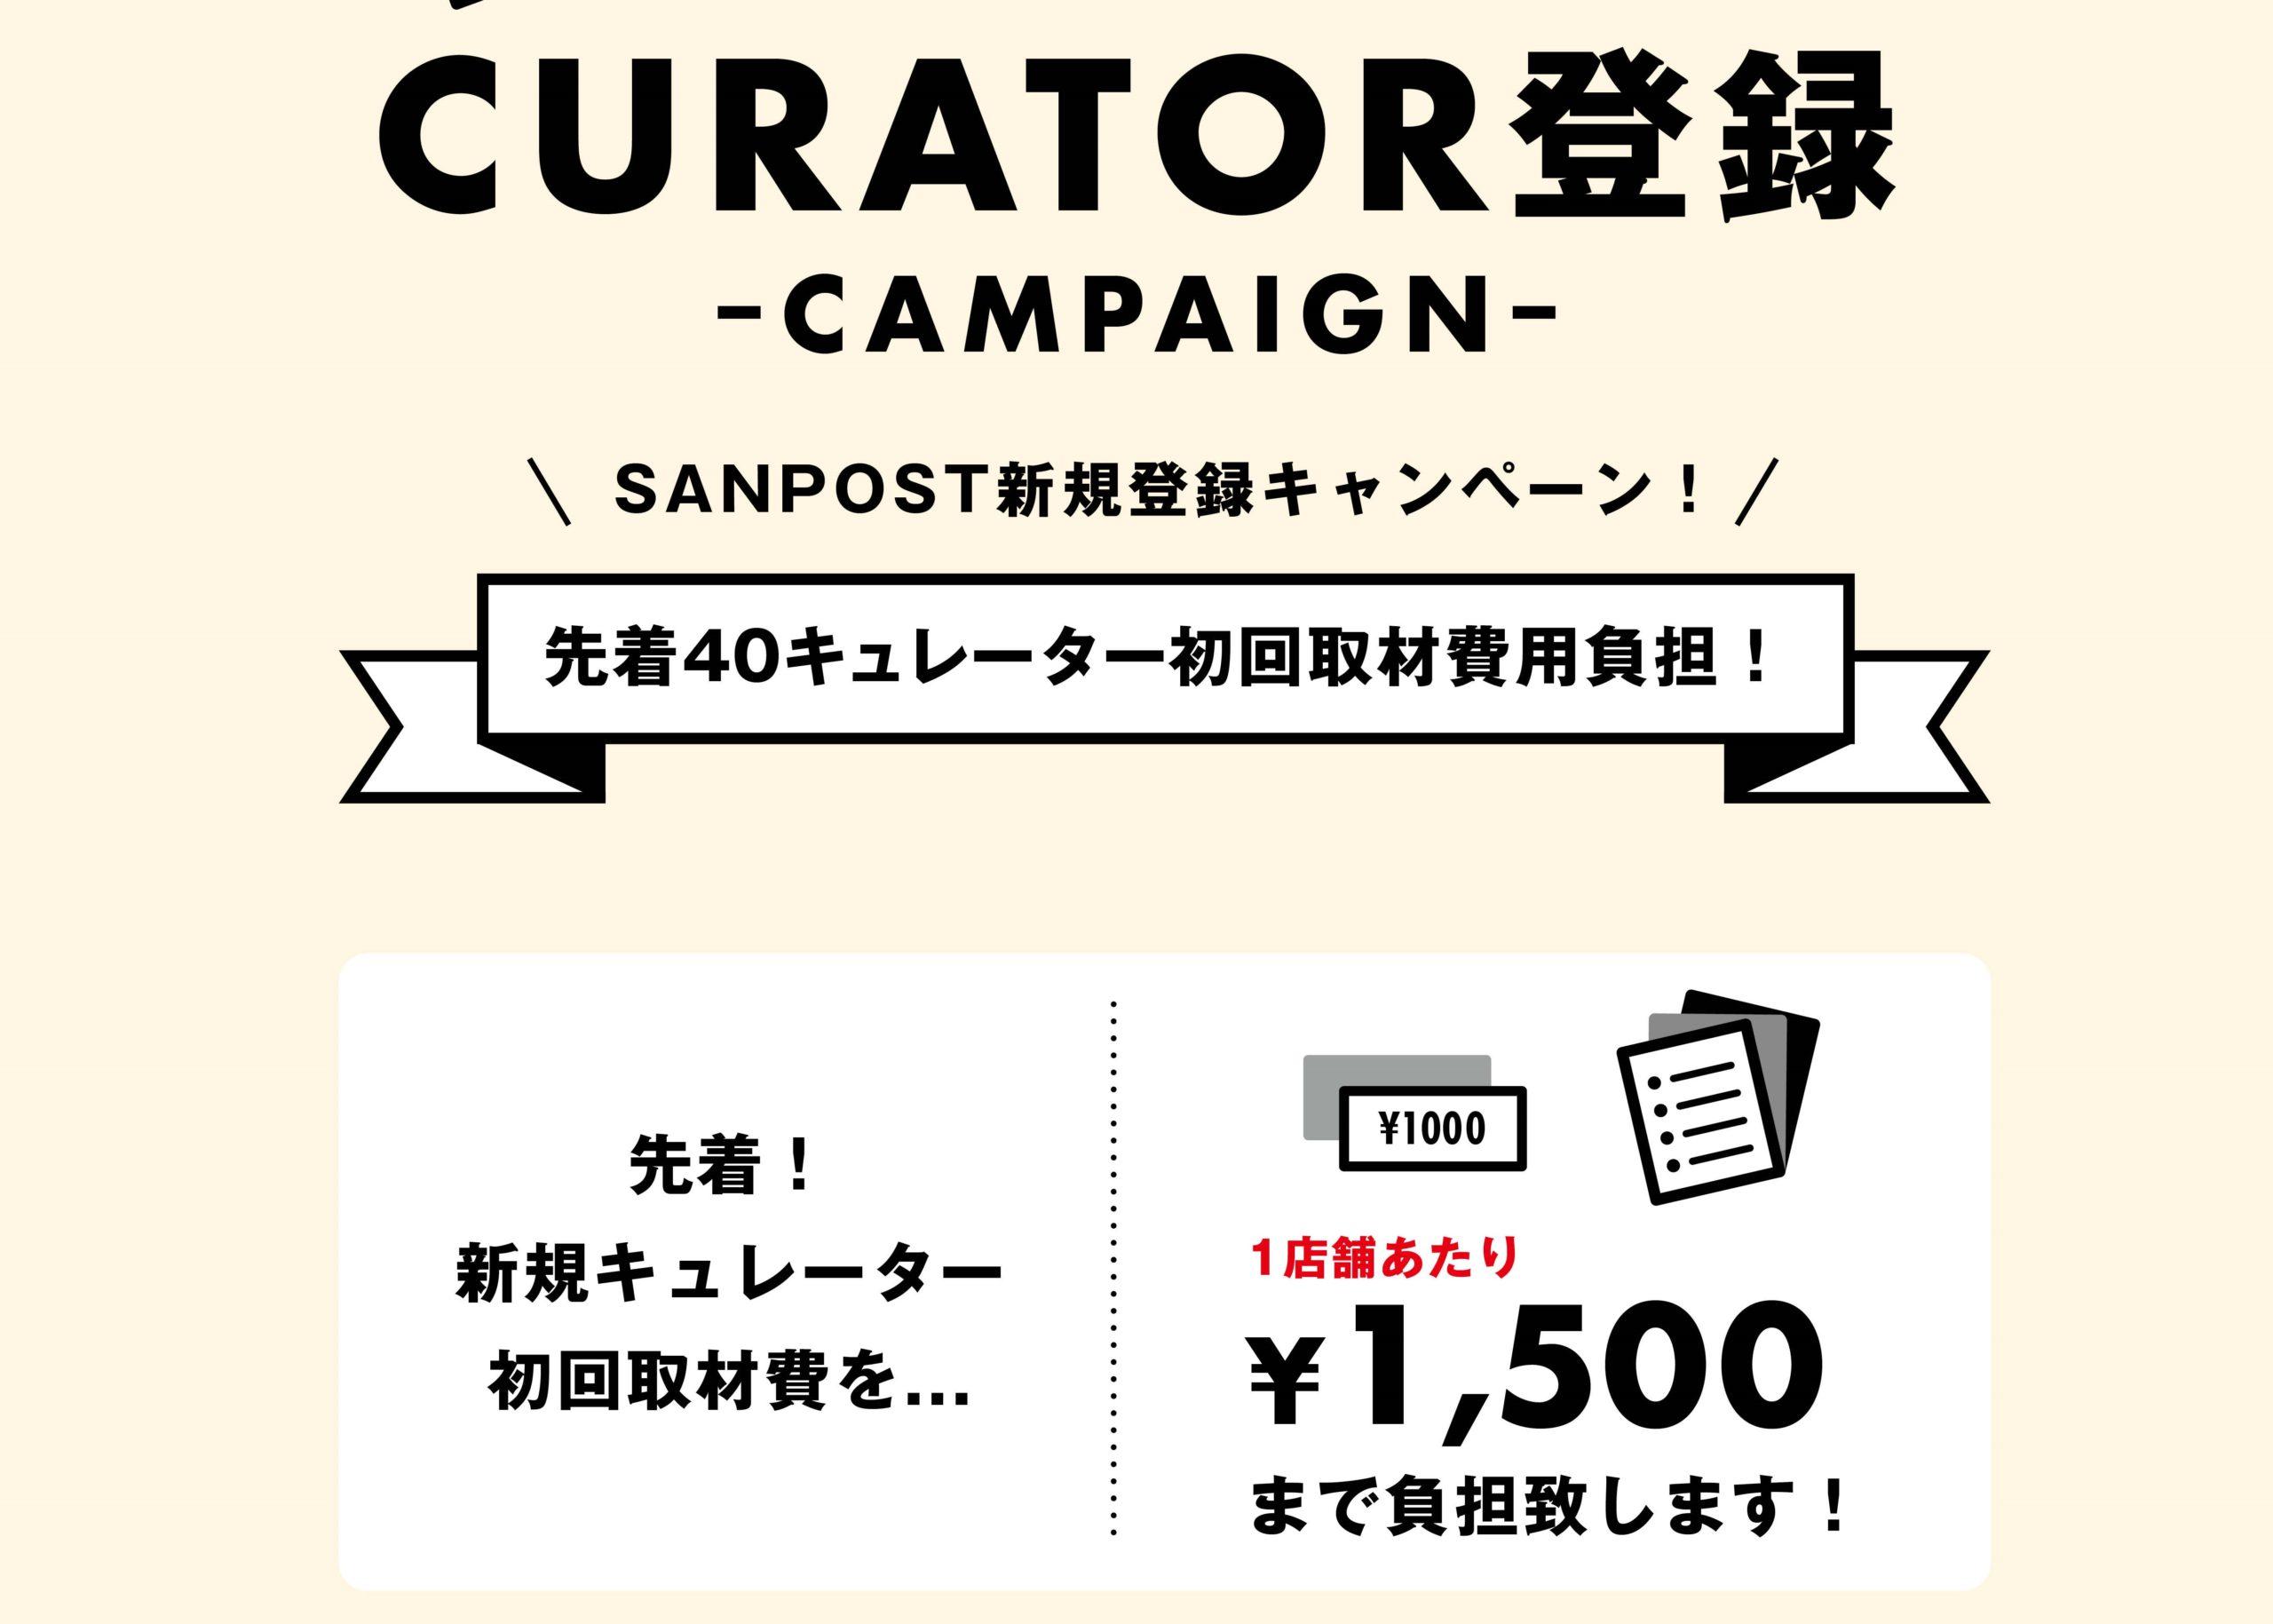 SANPOST キュレータ大募集!!